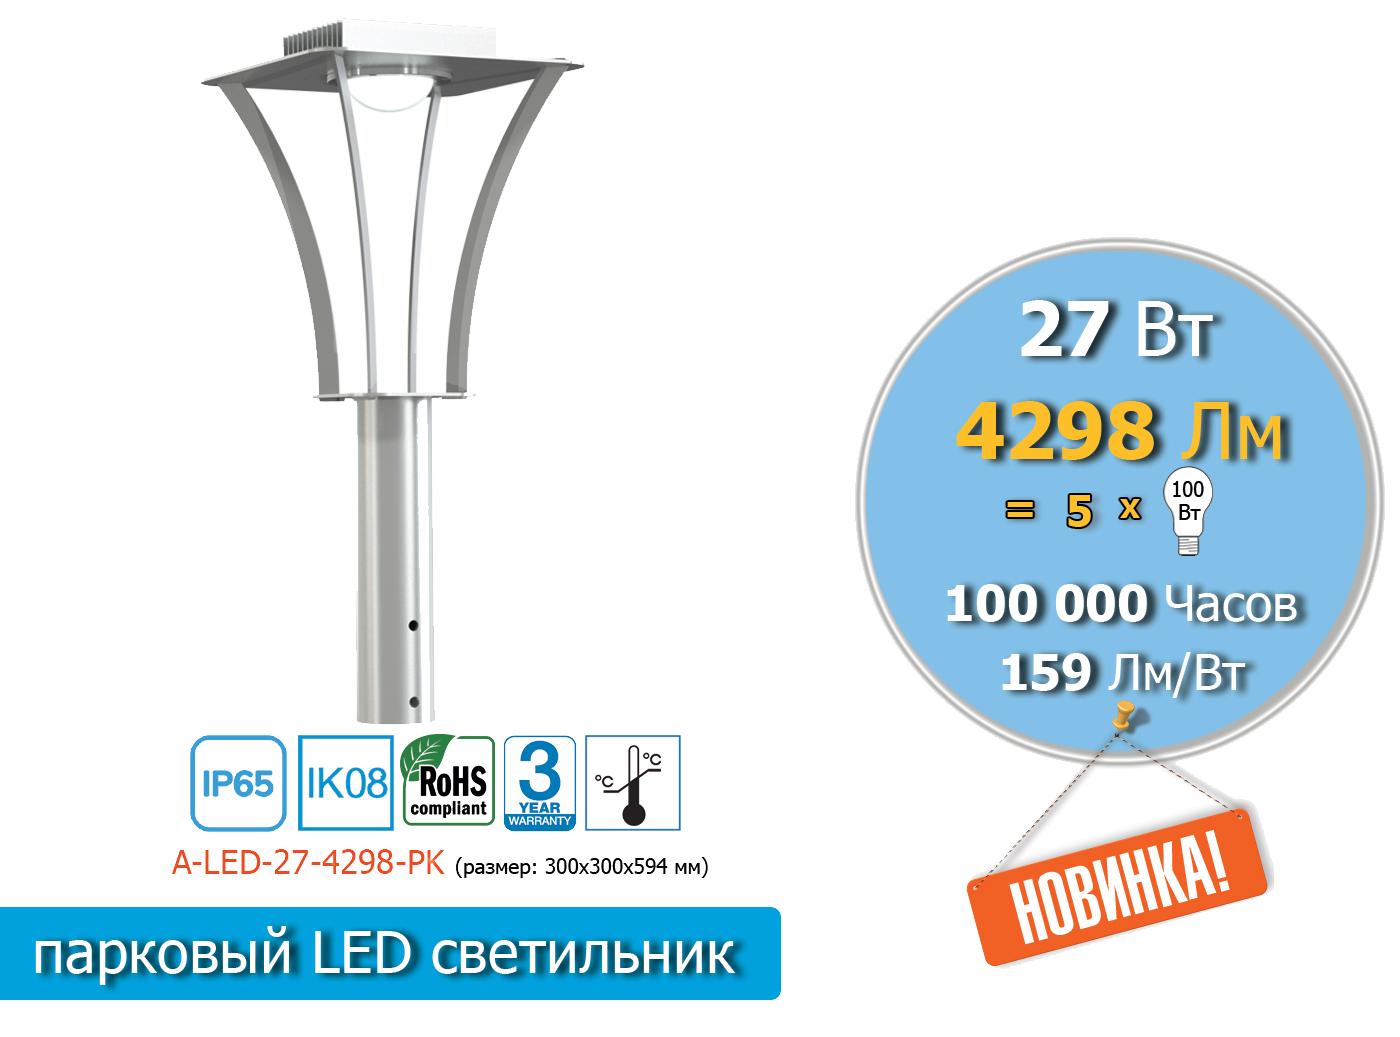 A-LED-27-4298-PK